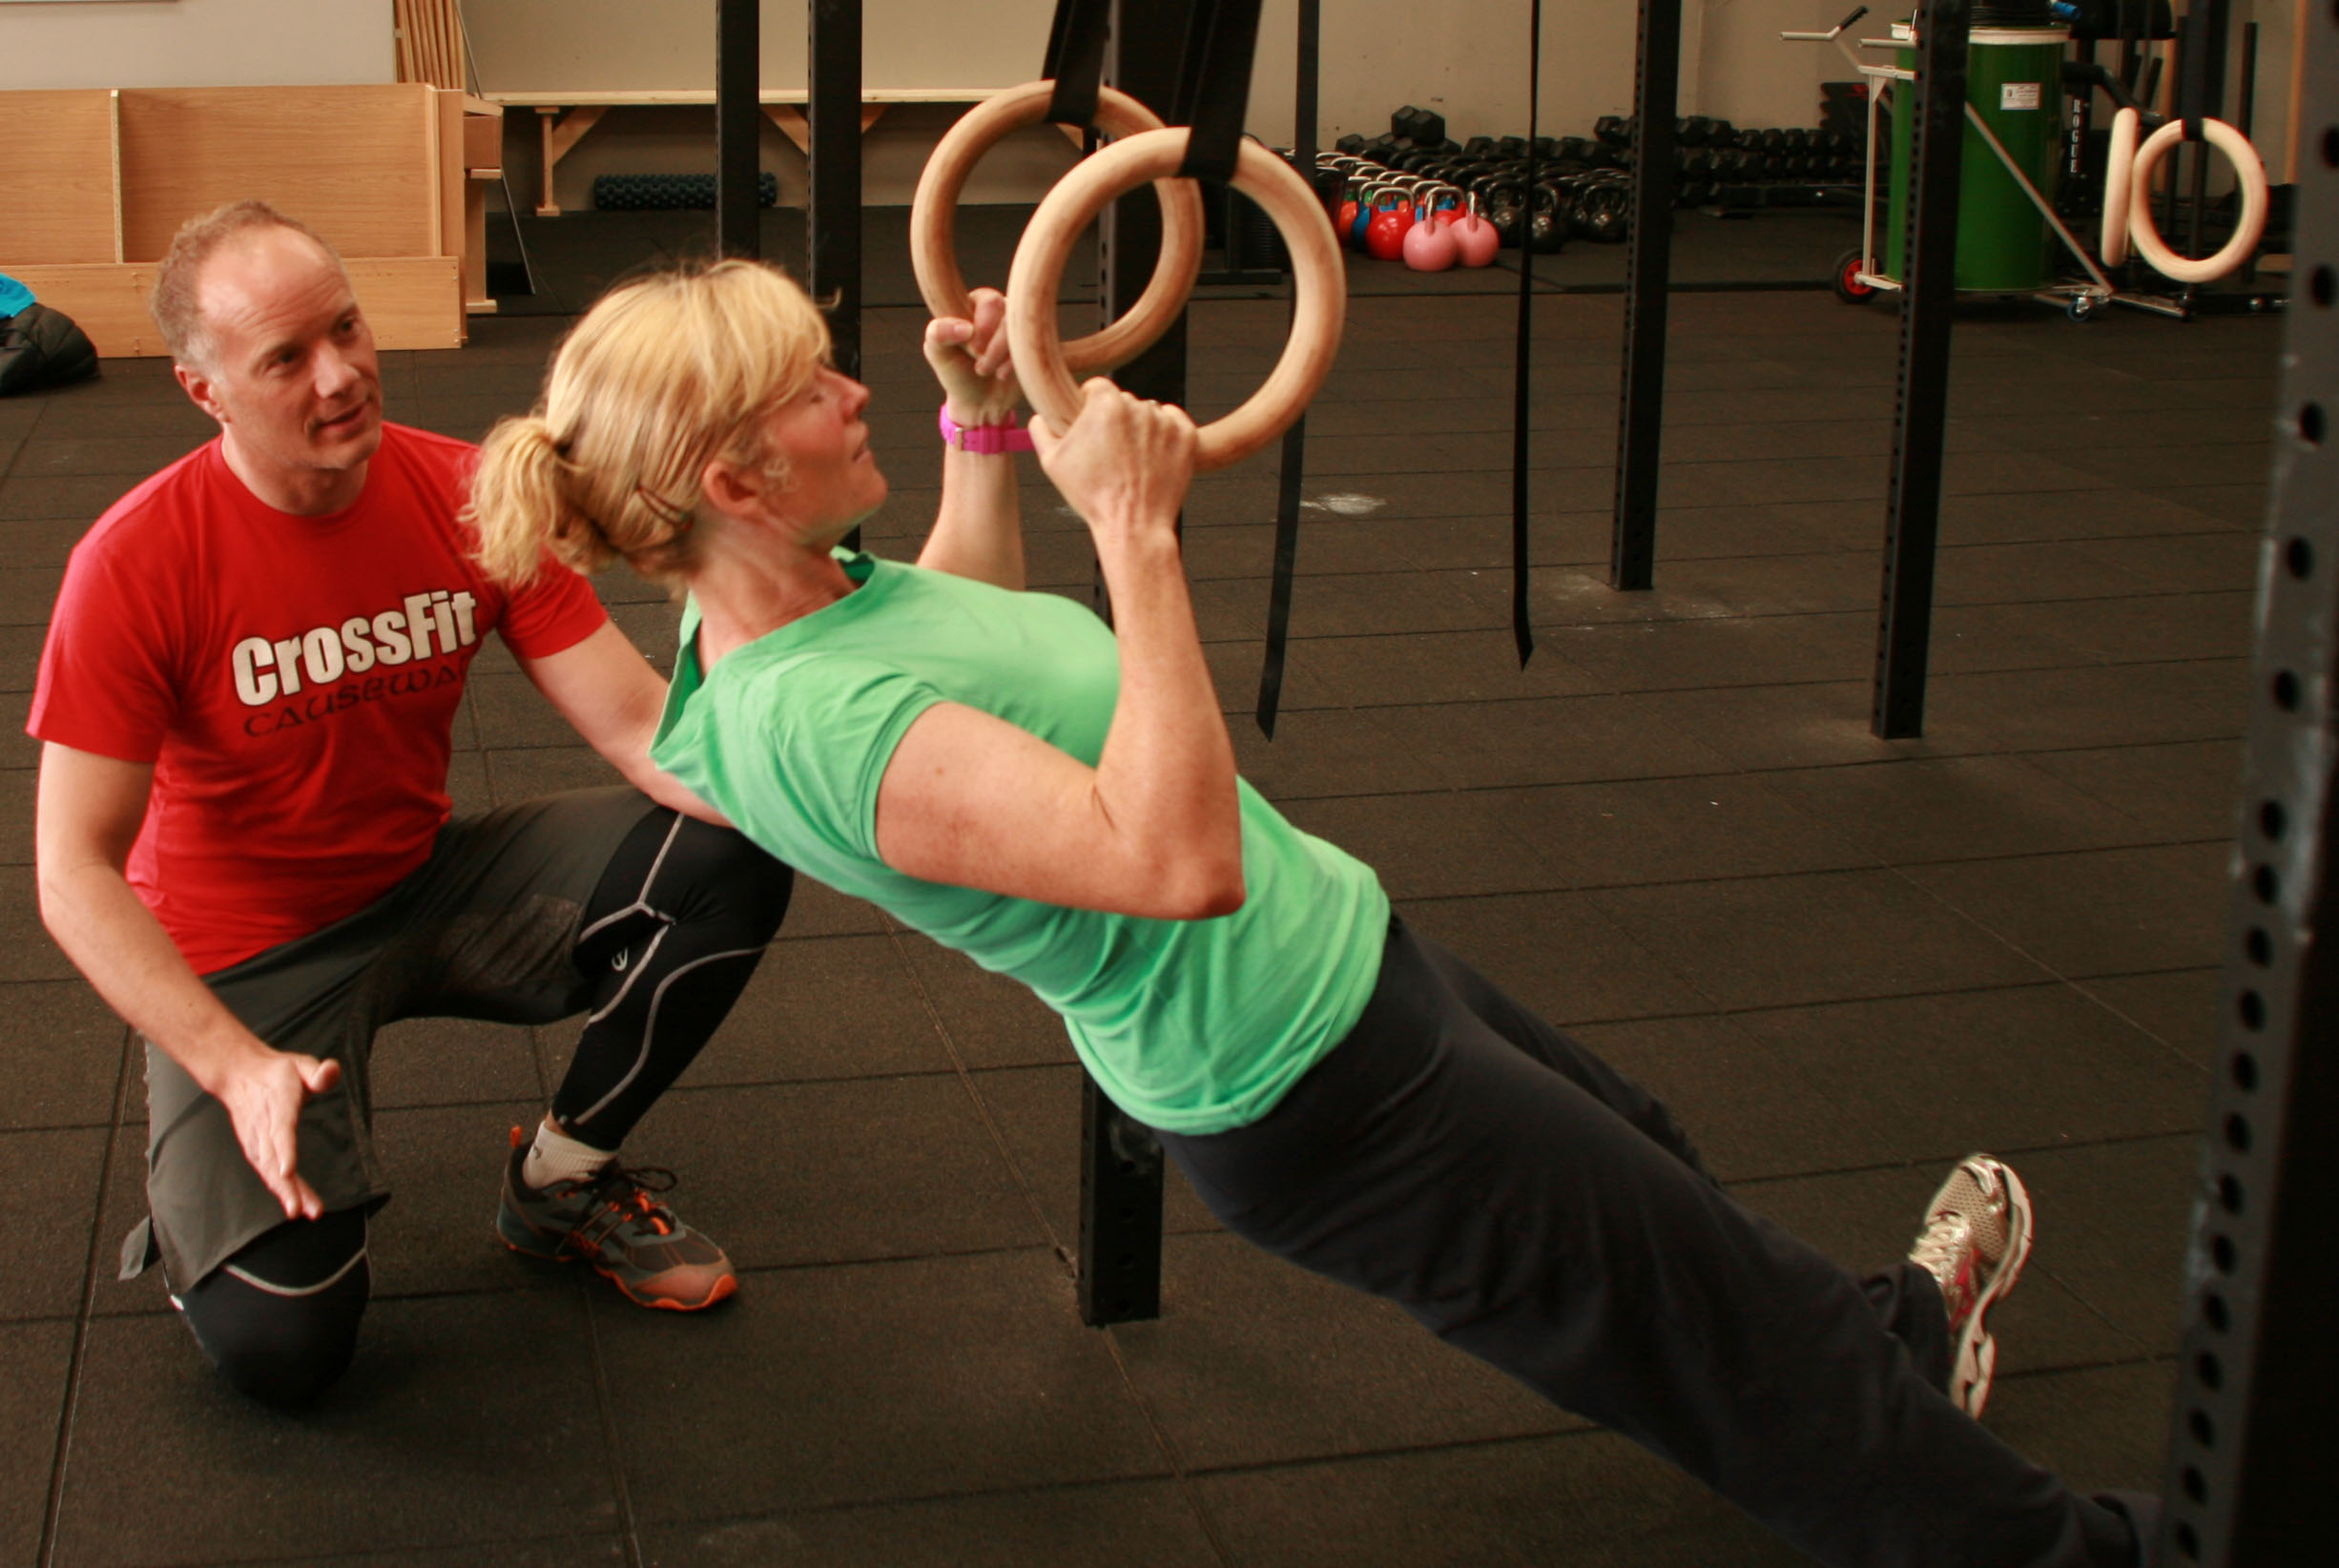 Les 5 rôles essentiels d'un coach de CrossFit®* !